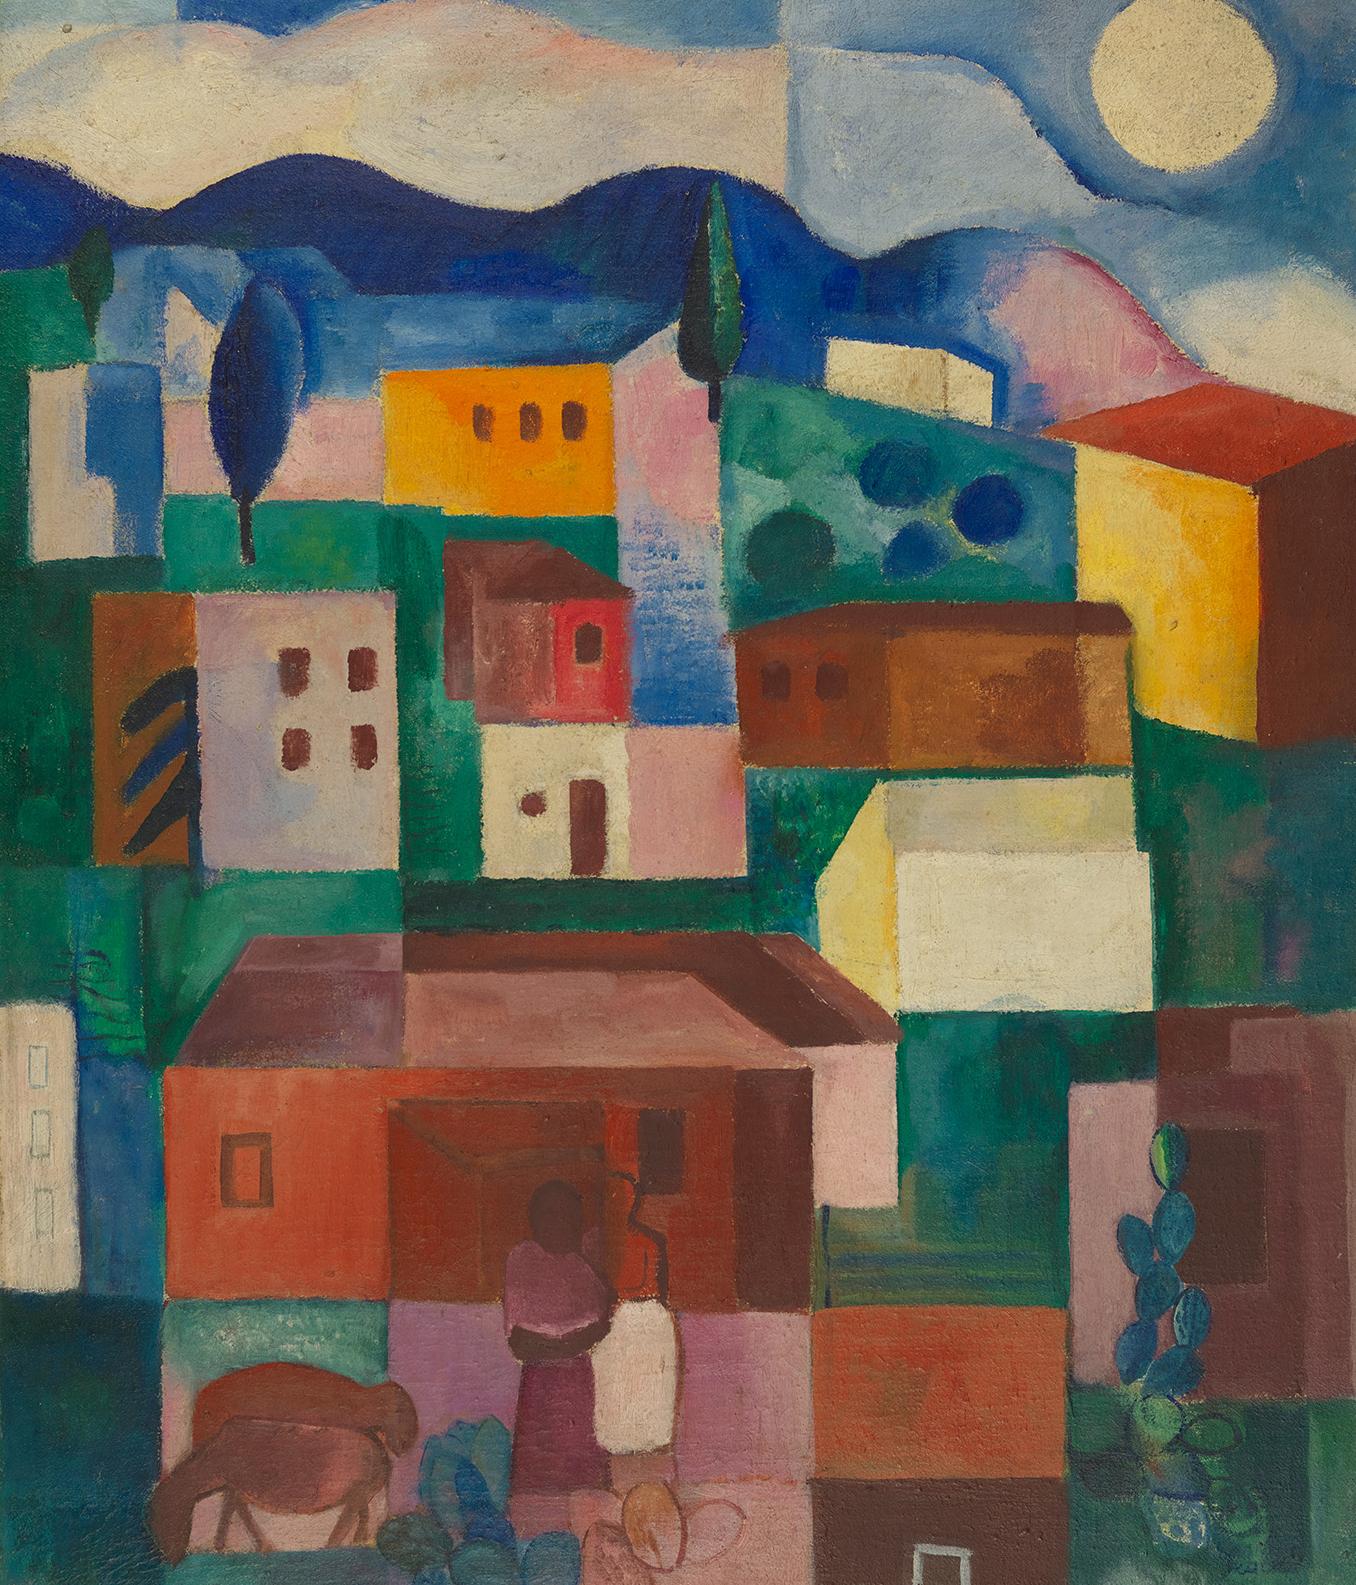 Paisagem brasileira, 1925, Lasar Segall